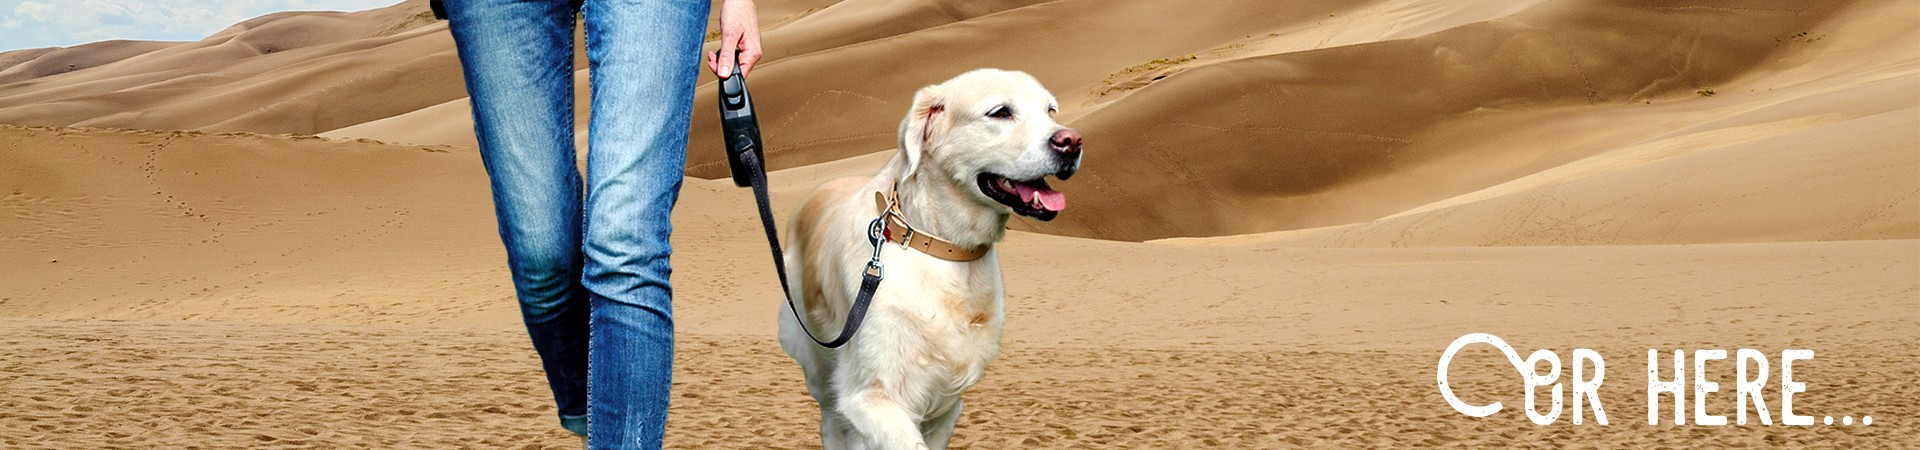 great-sand-dunes-national-park-preserve